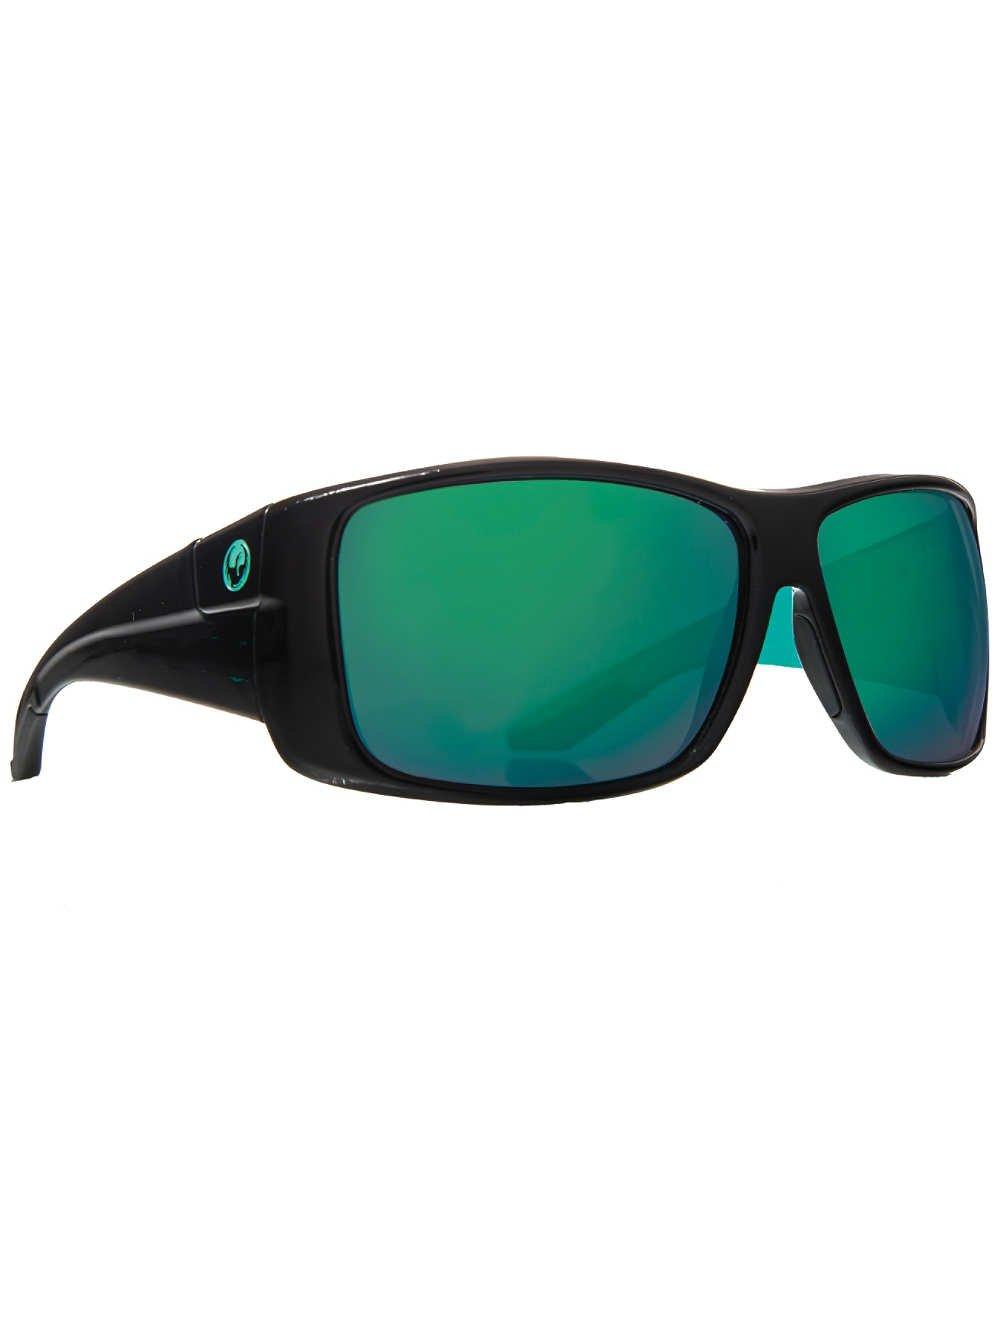 Dragon Alliance Teal/Green Ion P2 Kit Jet Sunglasses